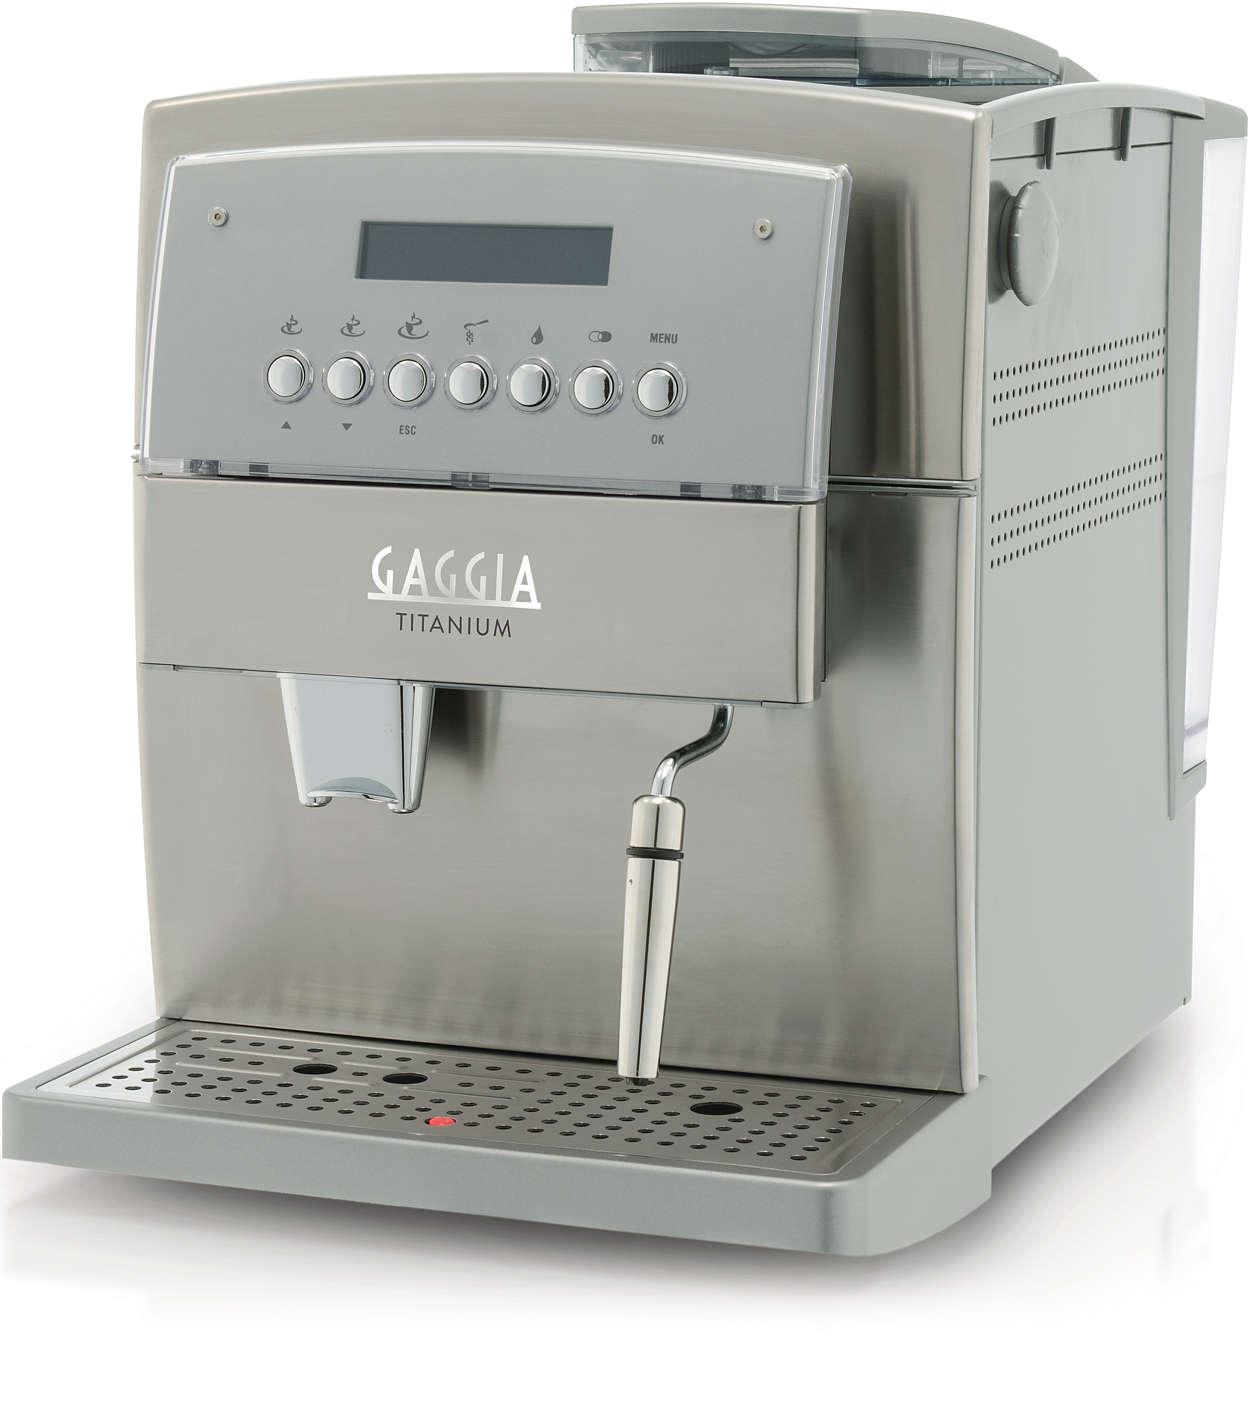 Découvrez la machine espresso Gaggia Titanium